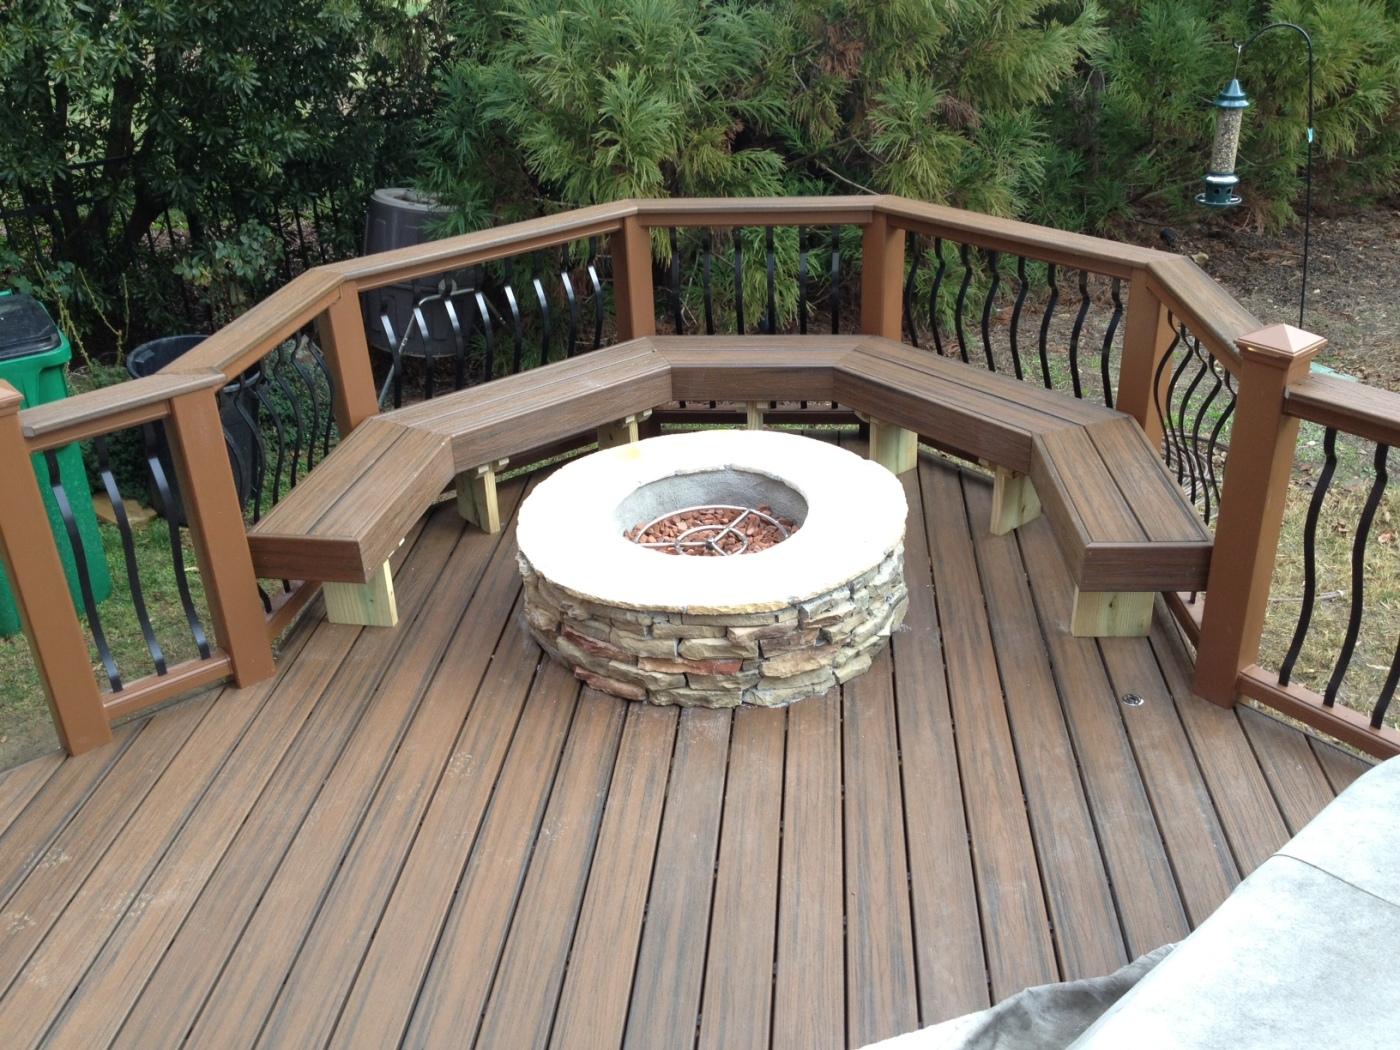 Metal fire pit on wood deck - Metal Fire Pit On Wood Deck 21